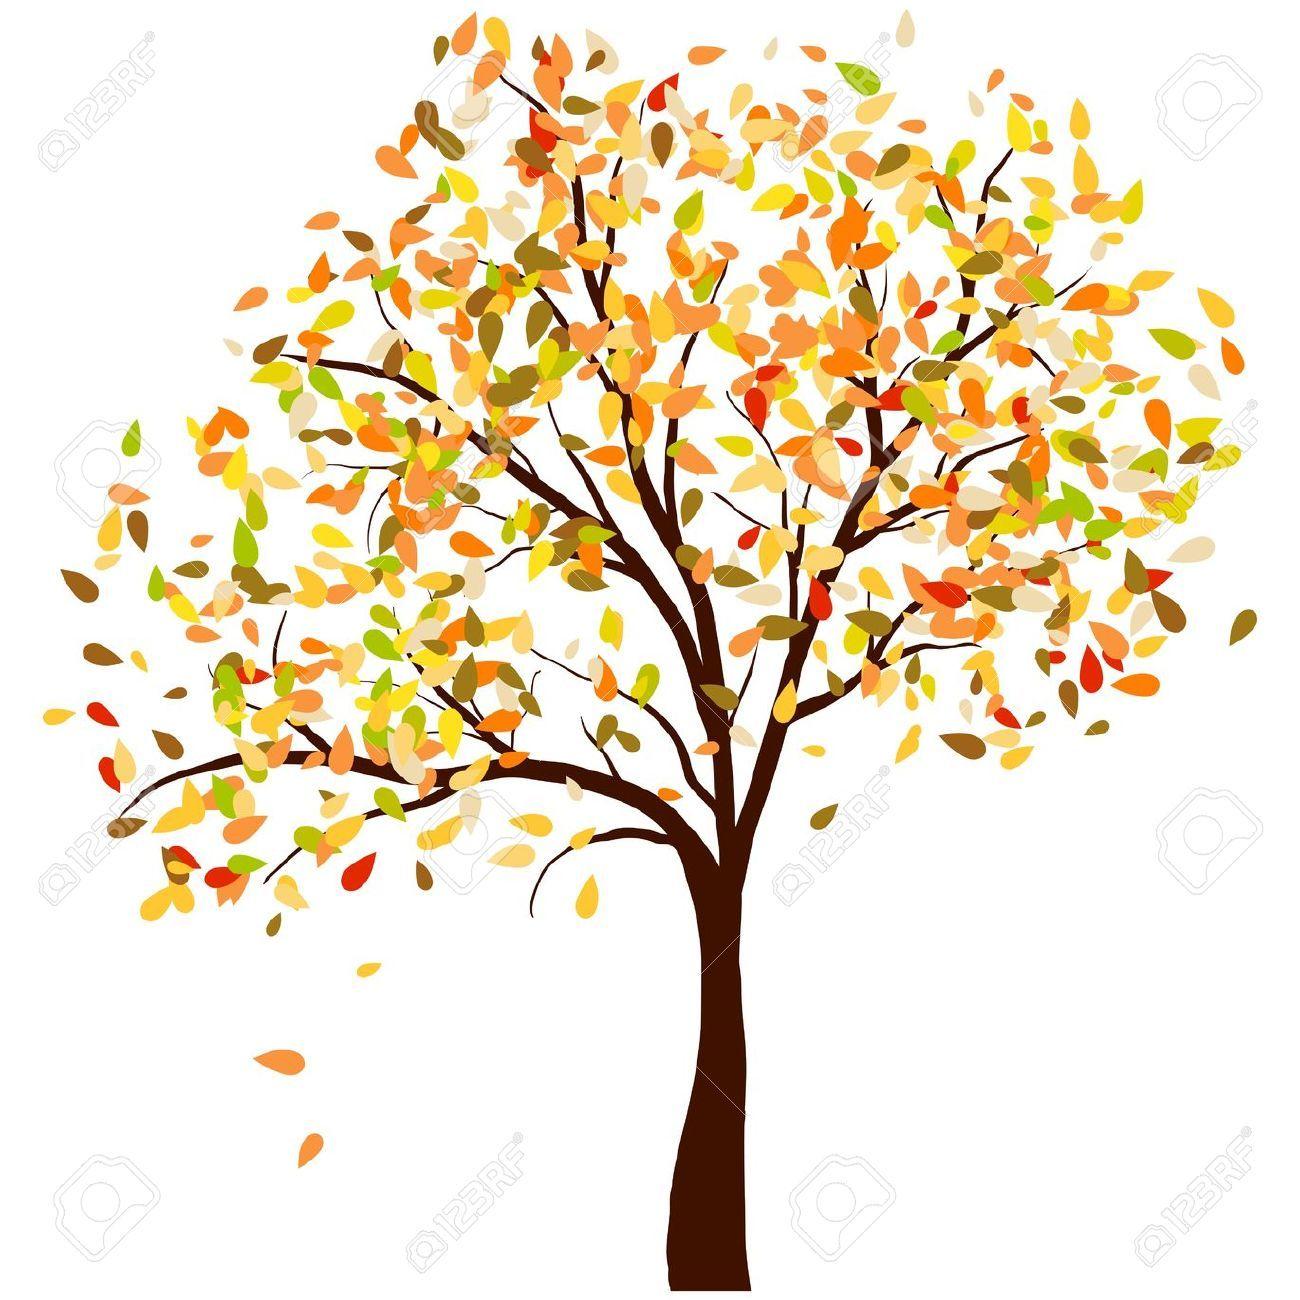 fall tree art - google